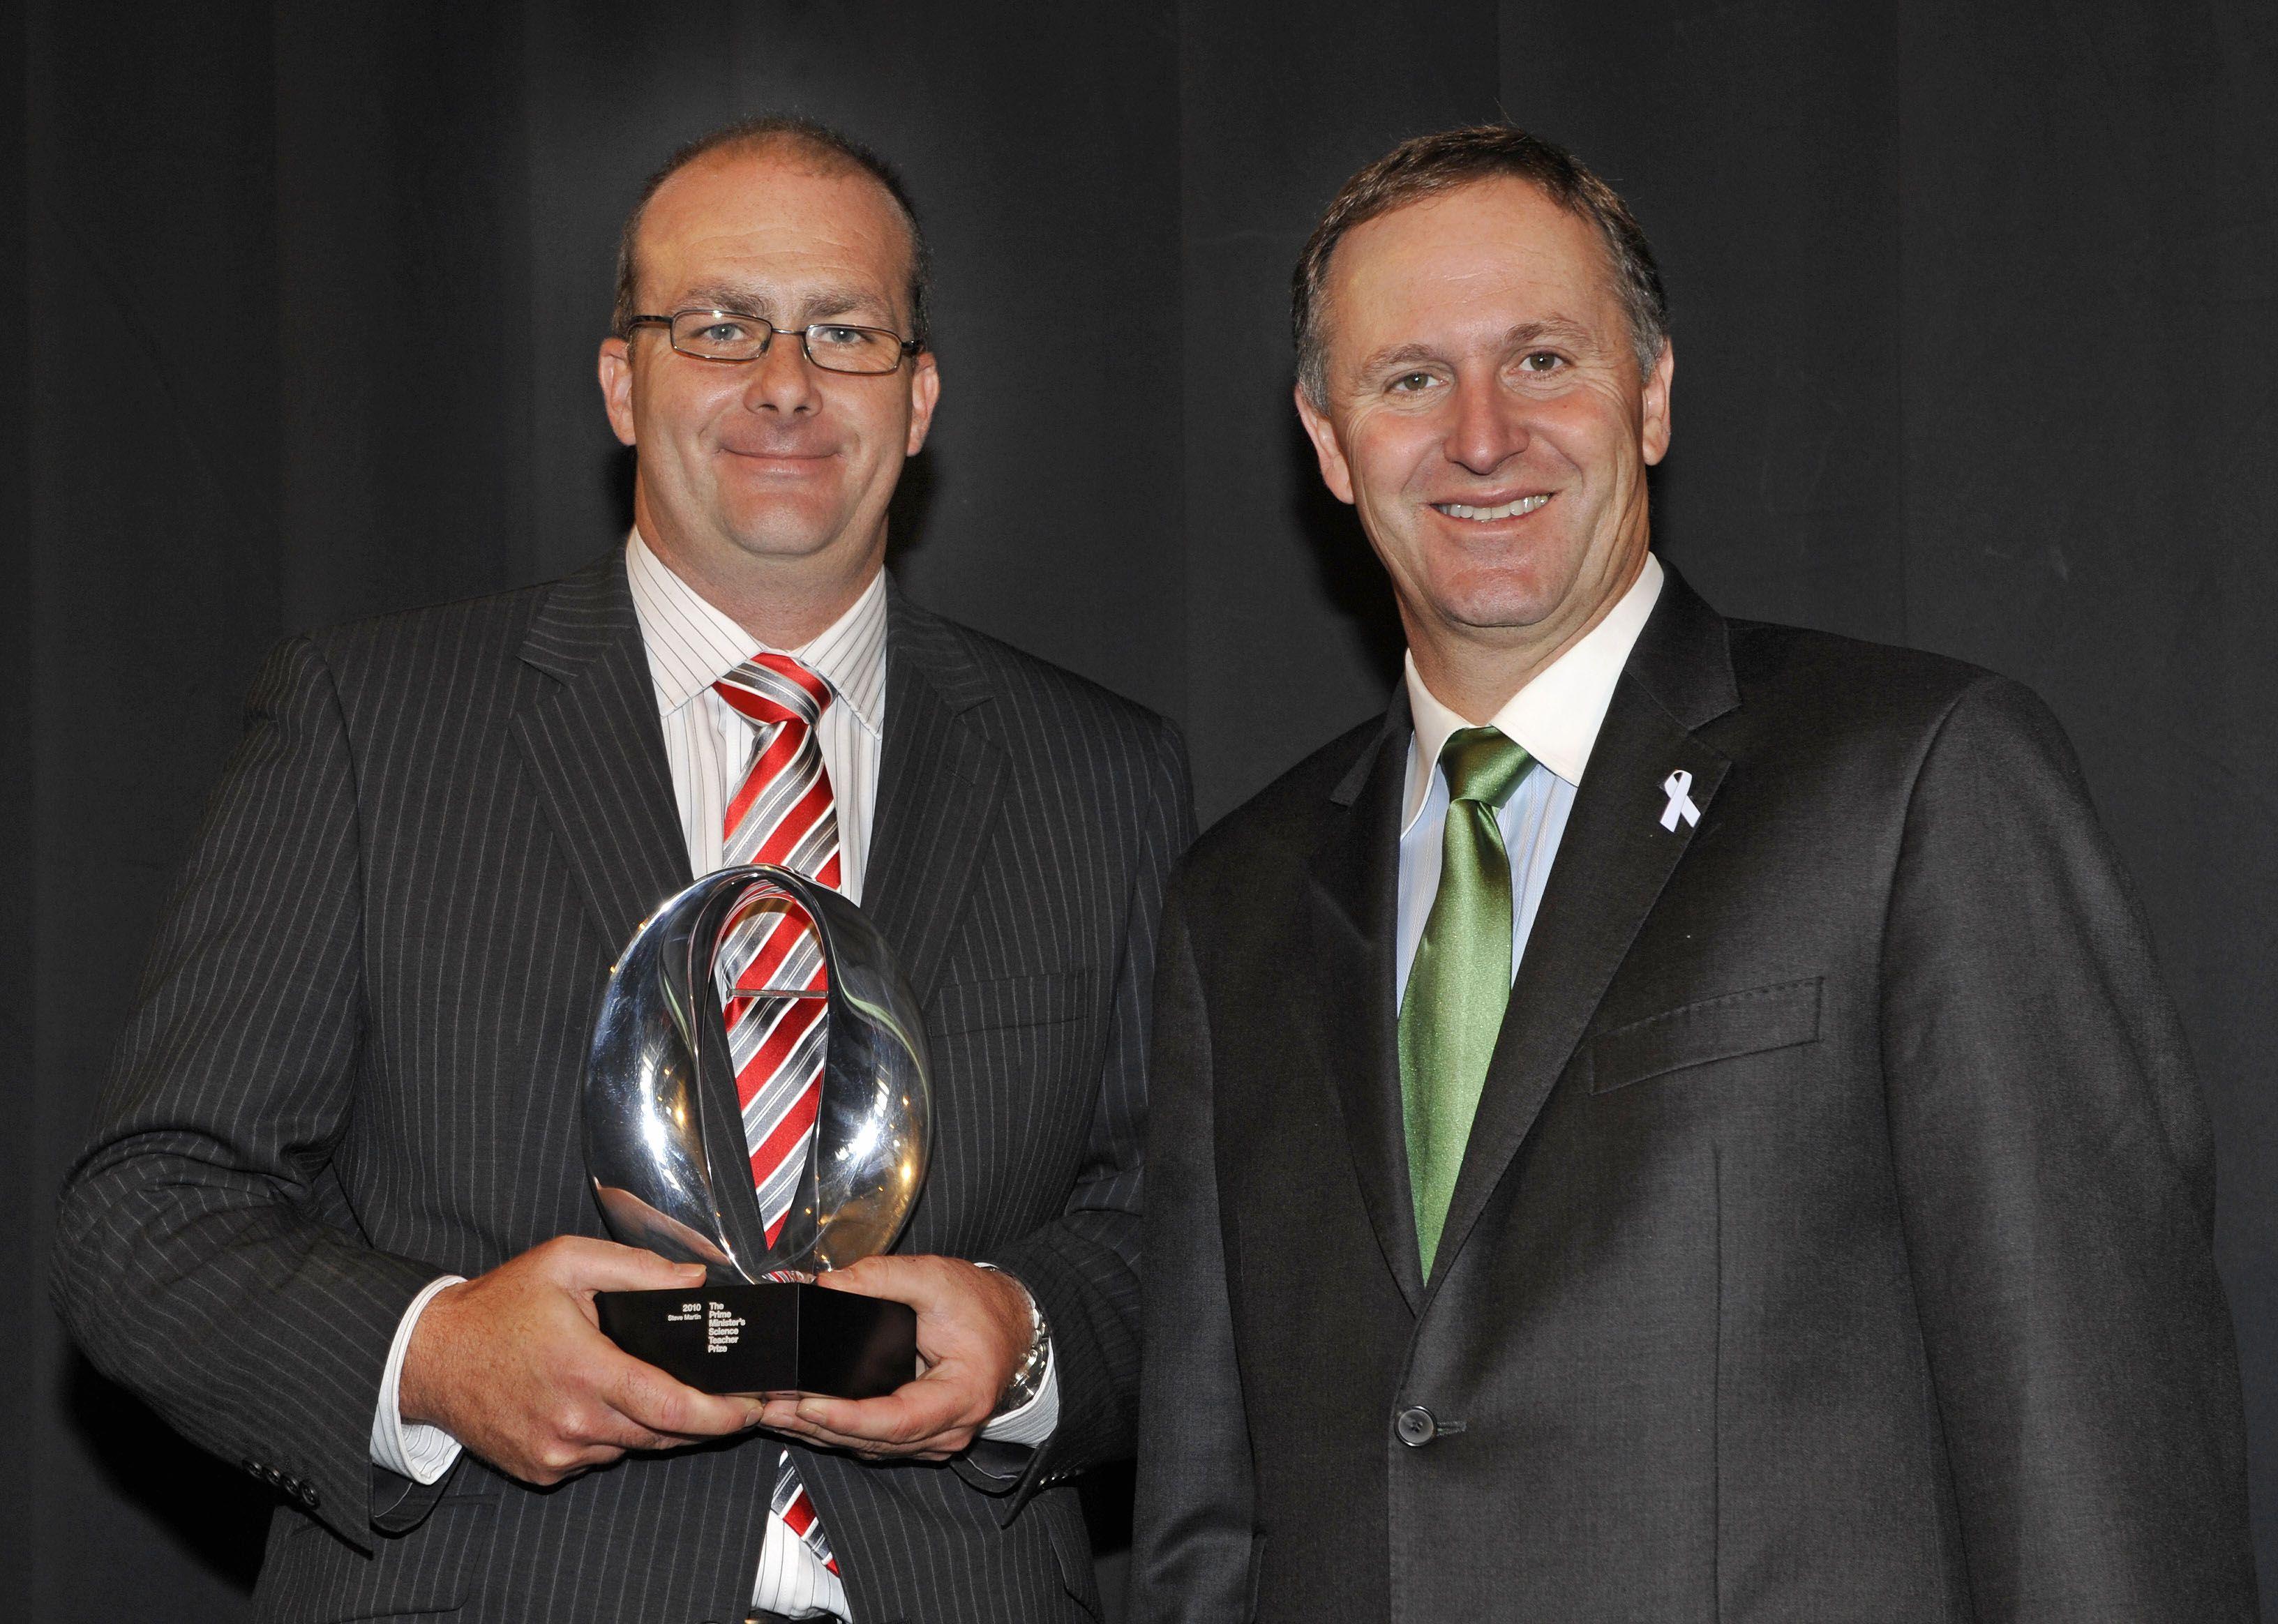 Image: The Prime Minister's Science Teacher Prize 2010